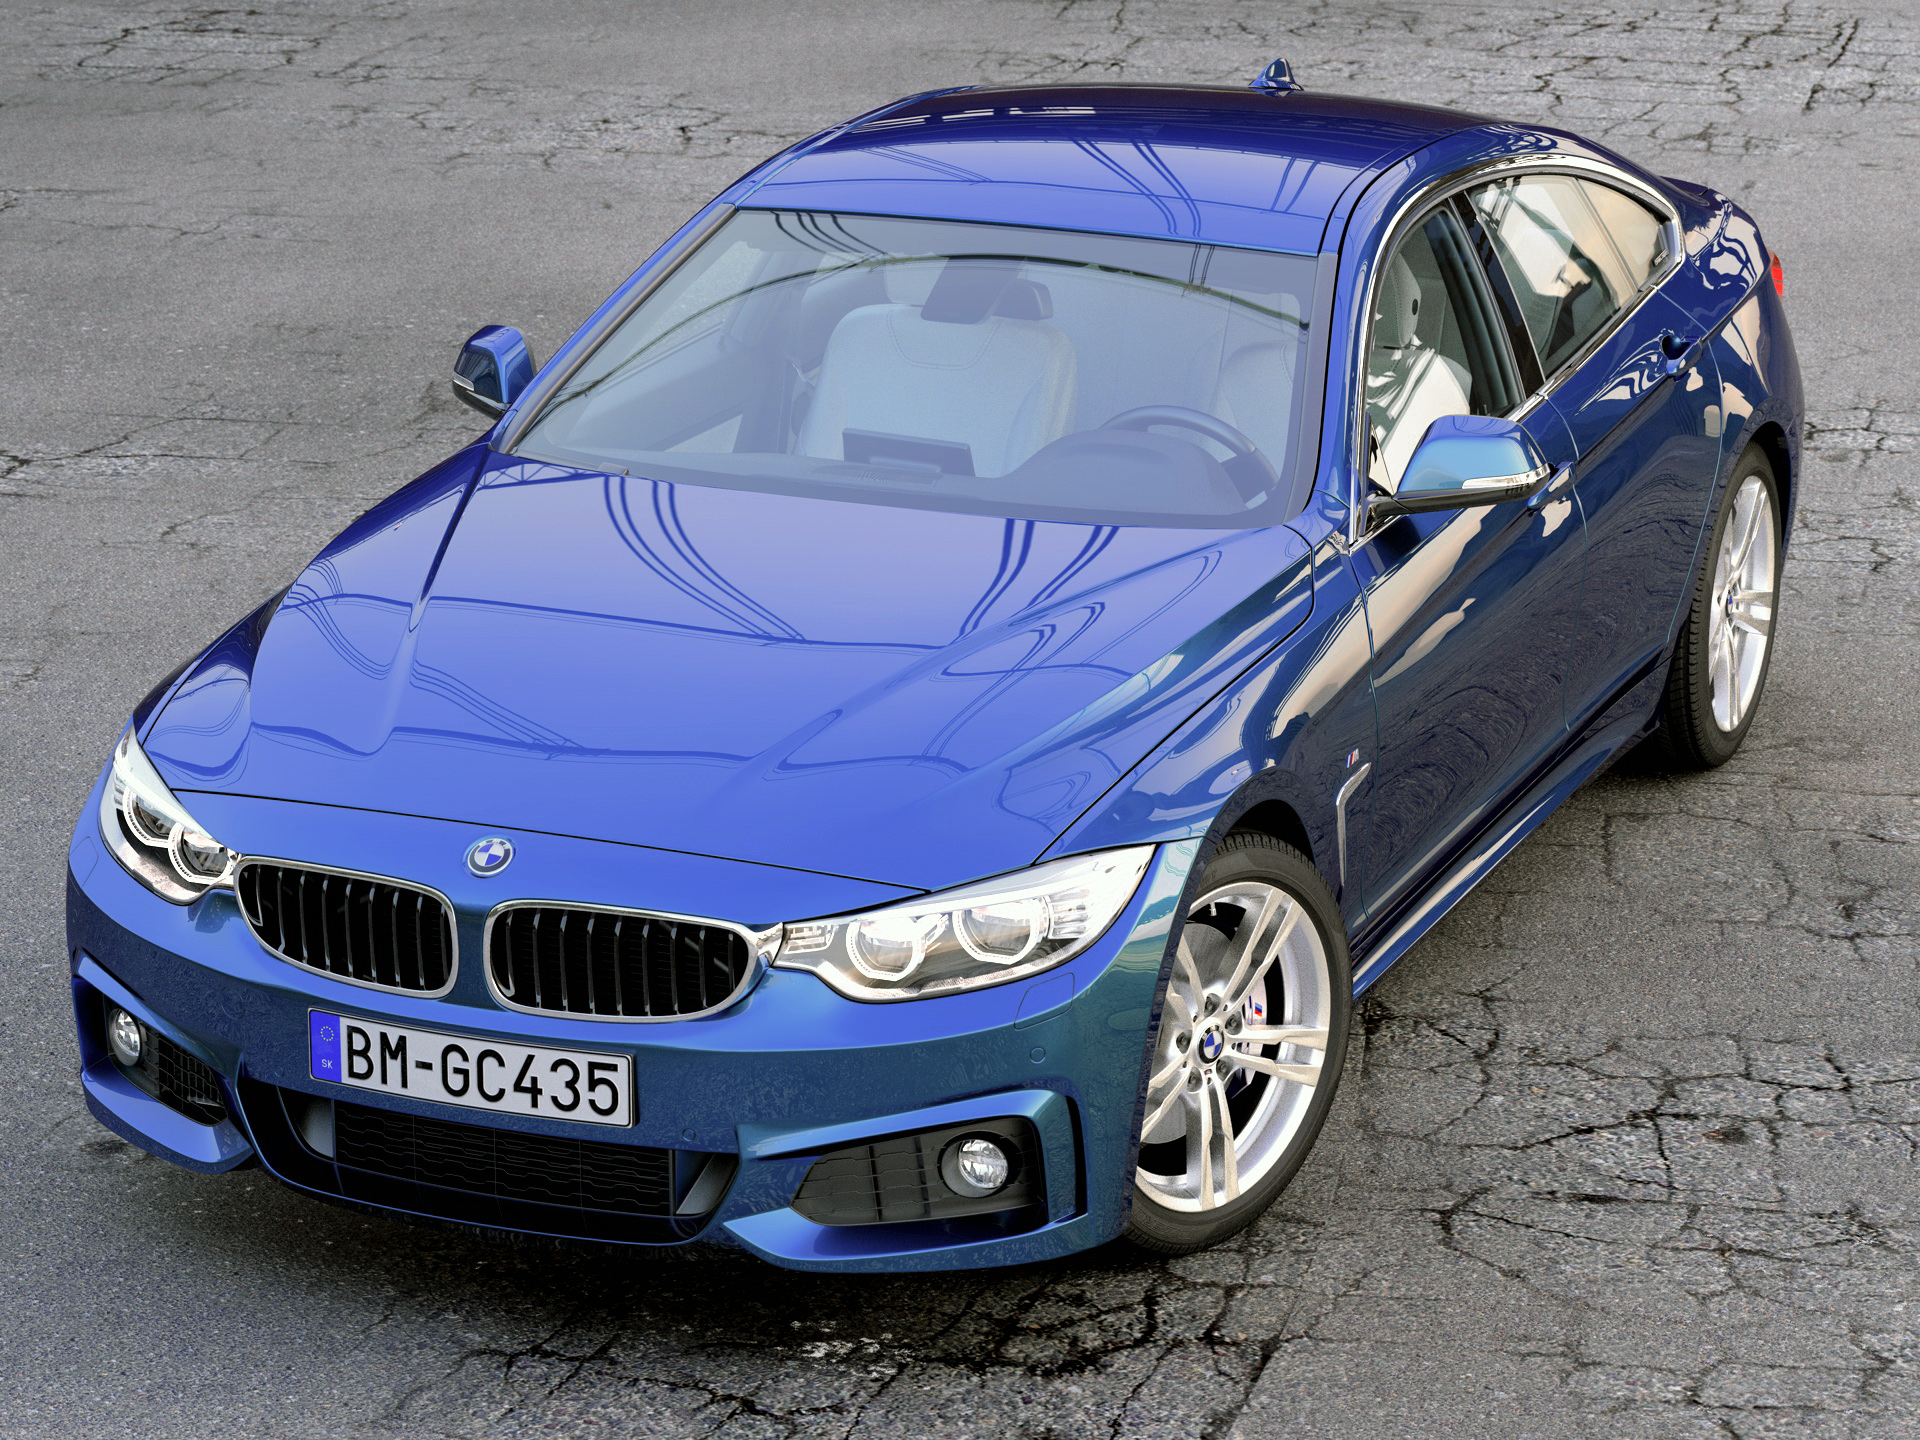 BMW 4 series F36 Gran Coupe 2015 3d model 3ds max fbx c4d obj 212948